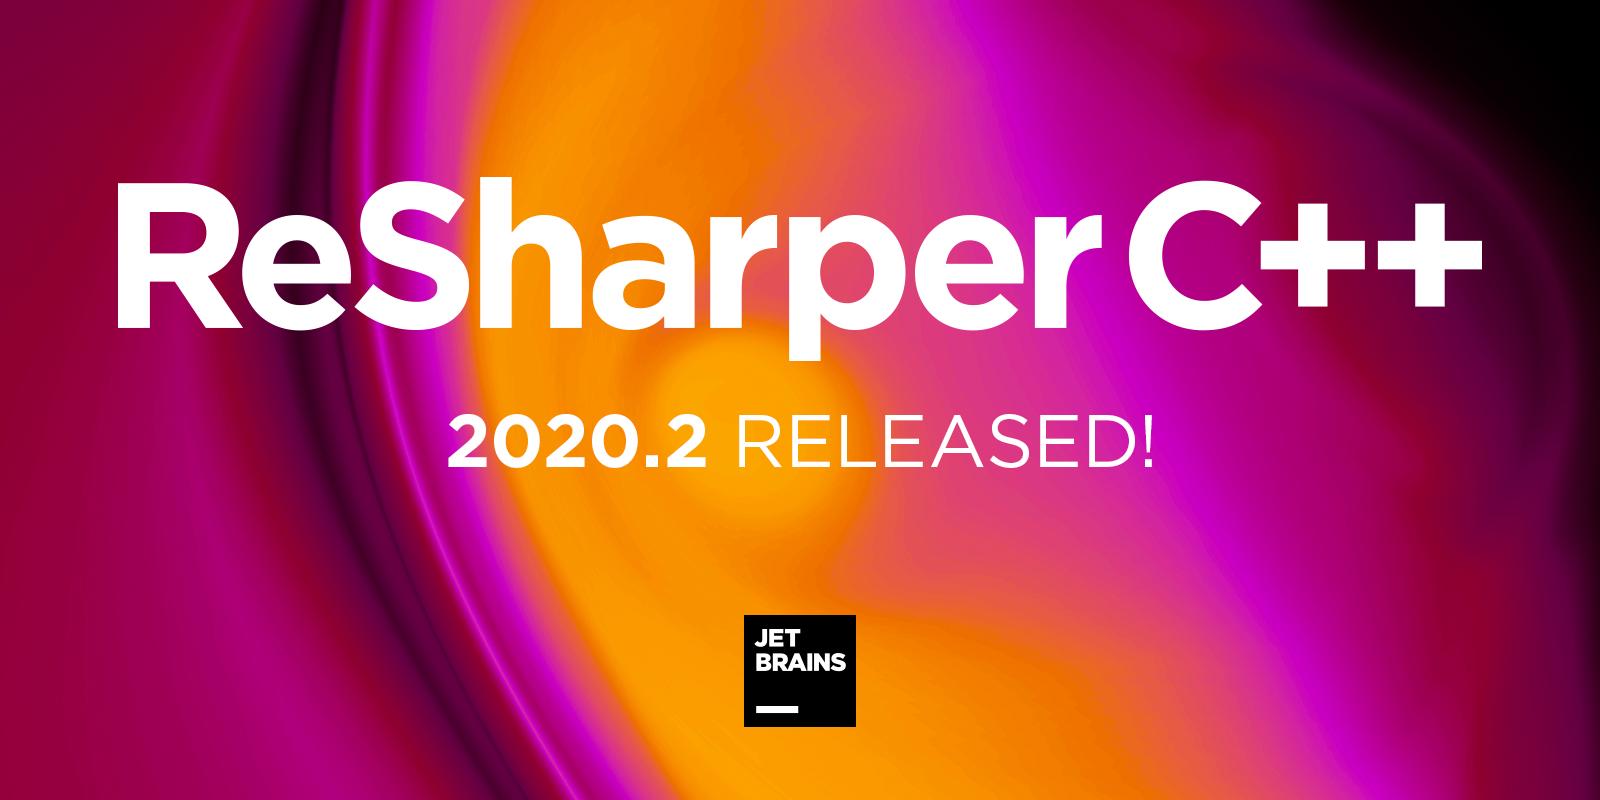 ReSharper C++ 2020.2